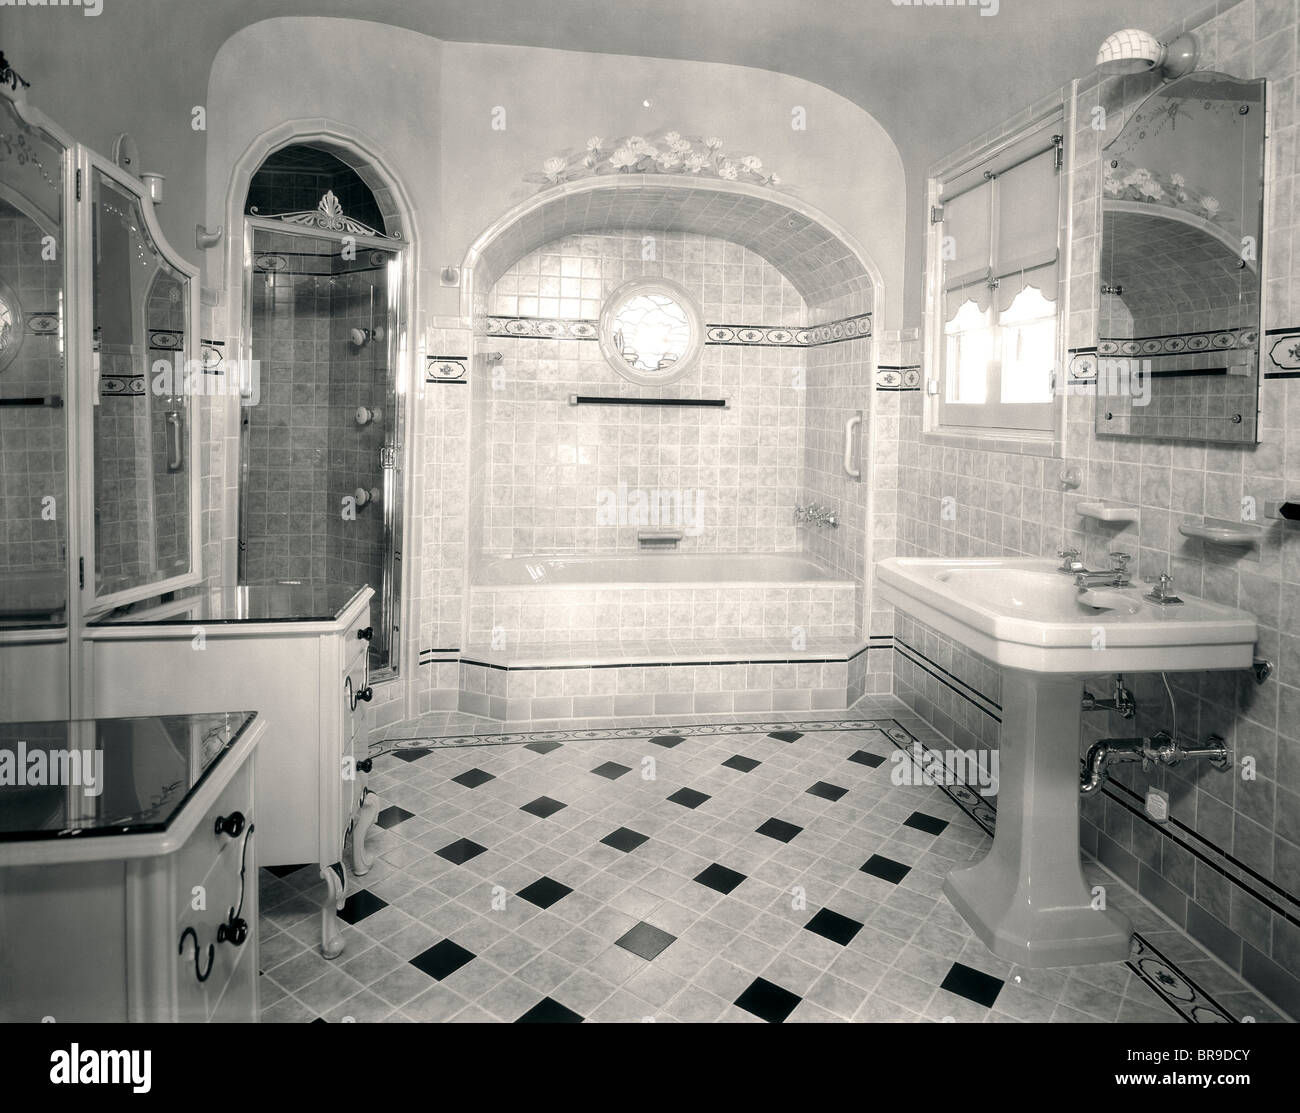 1920s Interior Upscale Tiled Bathroom Stock Photo Alamy